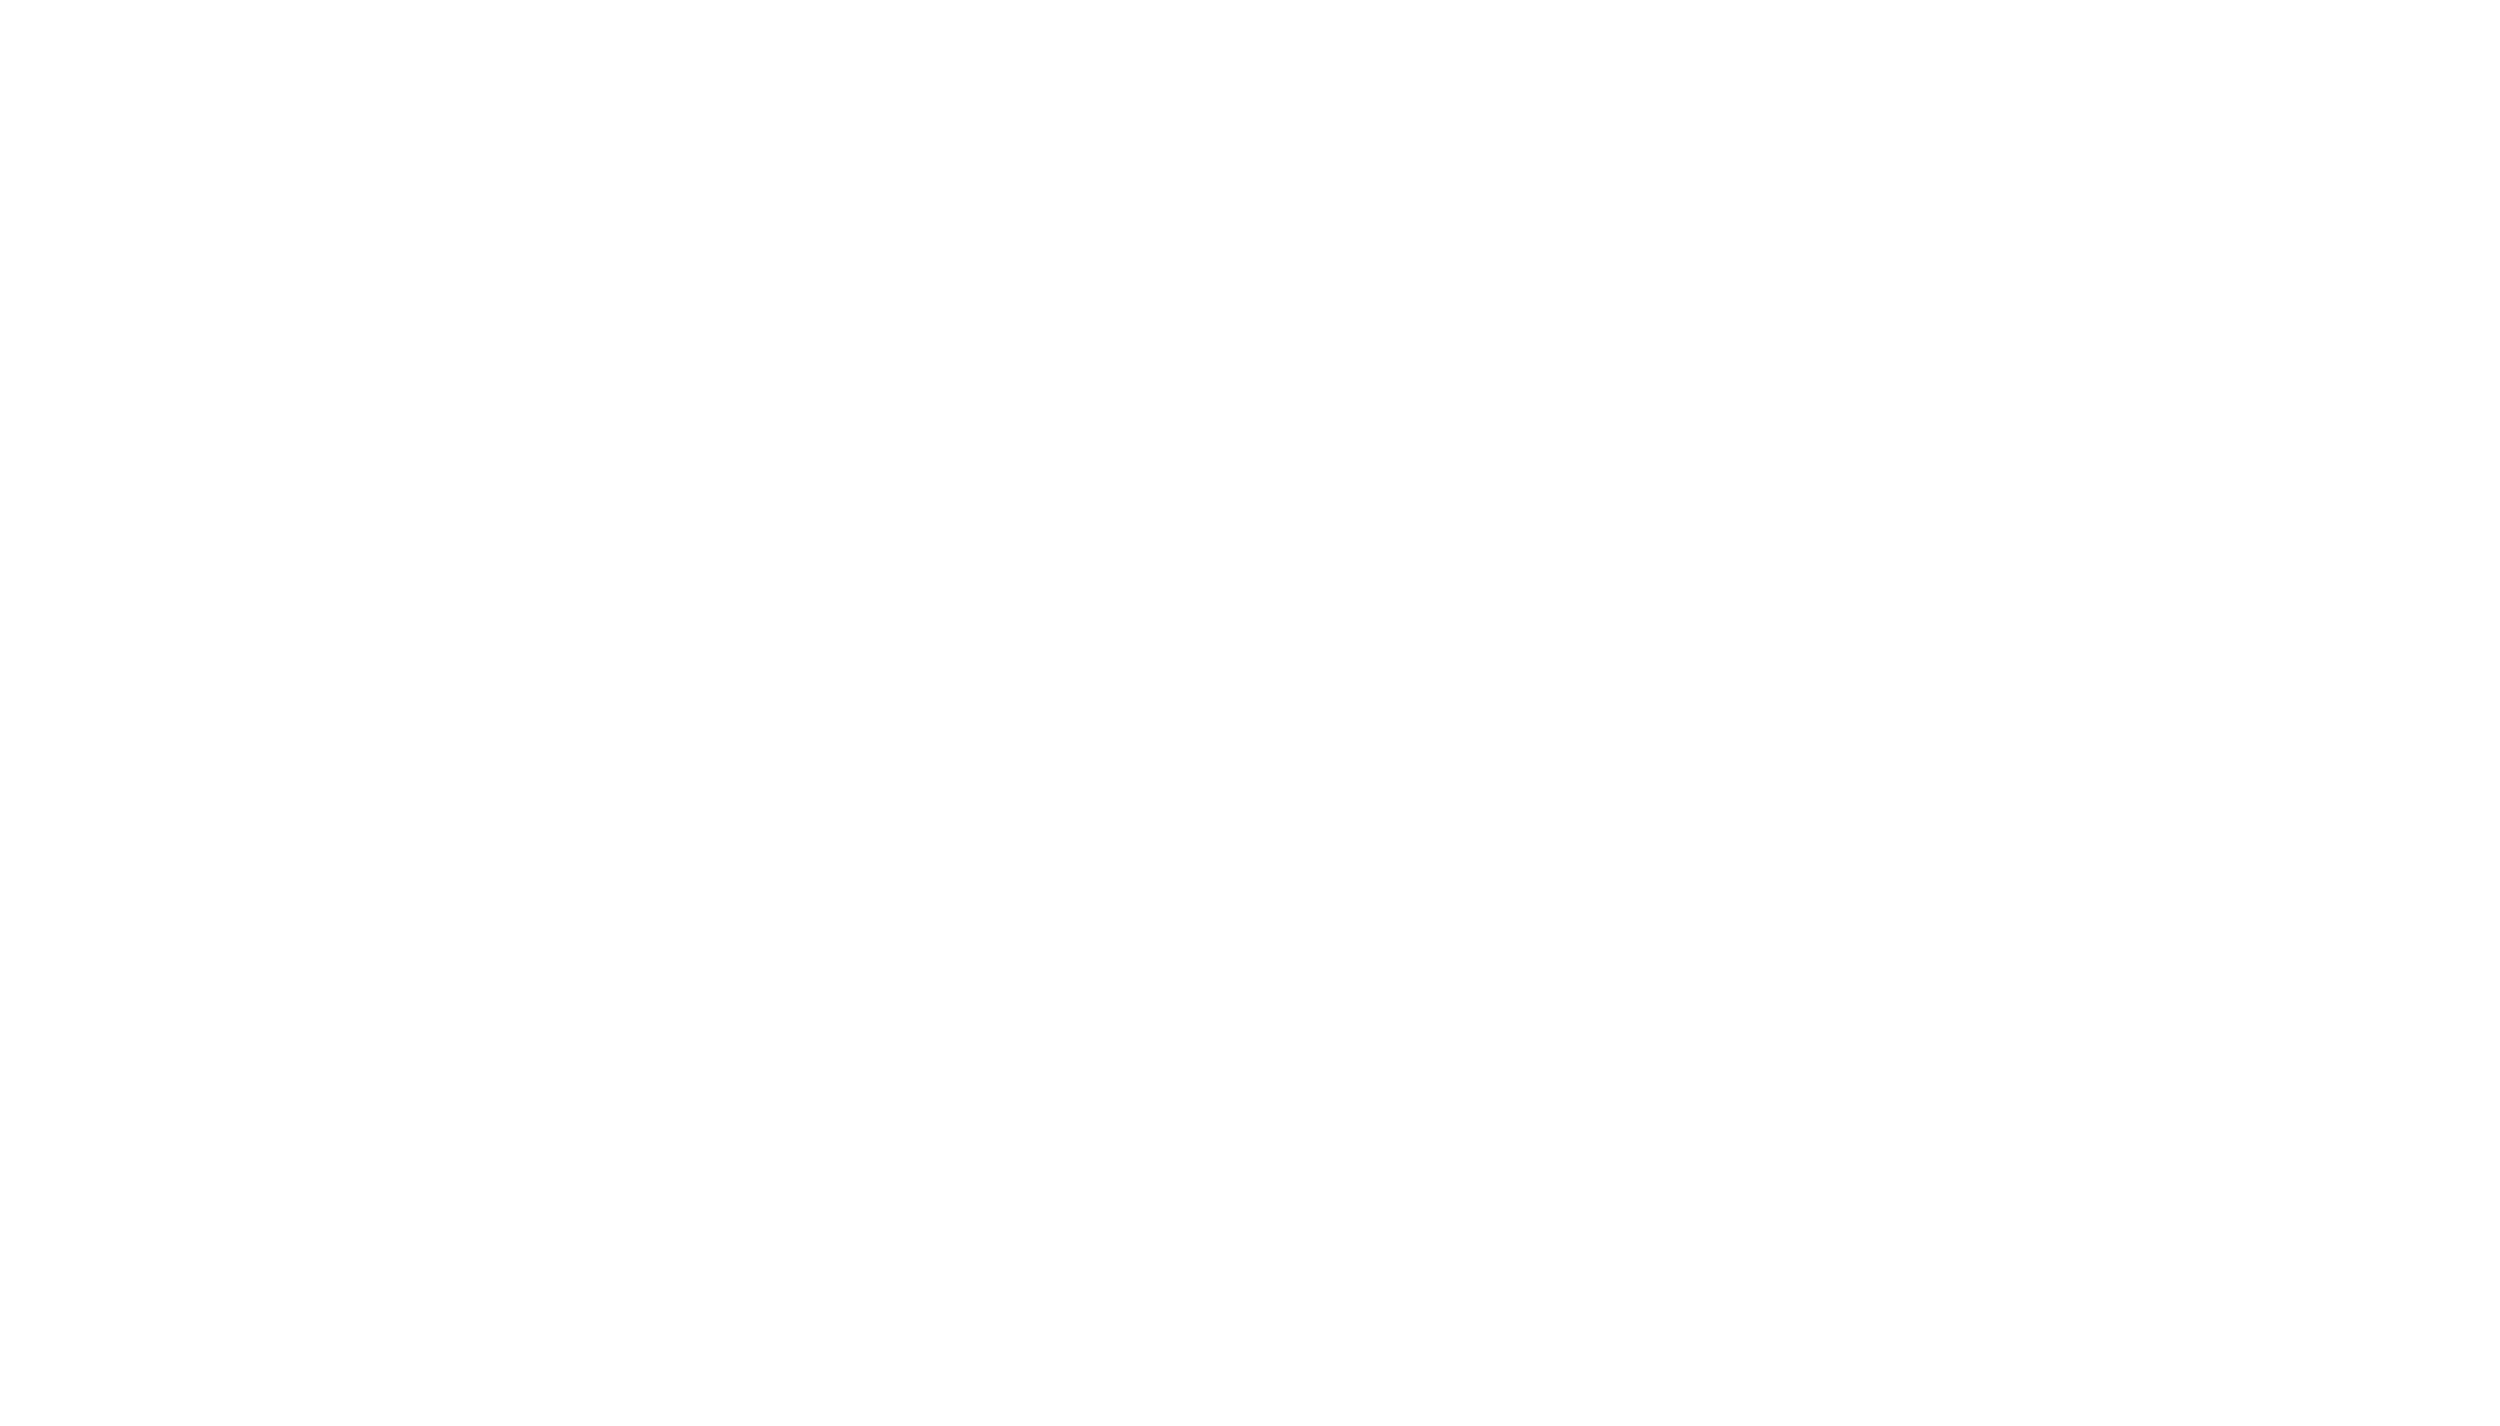 Wild Pizza Co.-logo-white (1).png